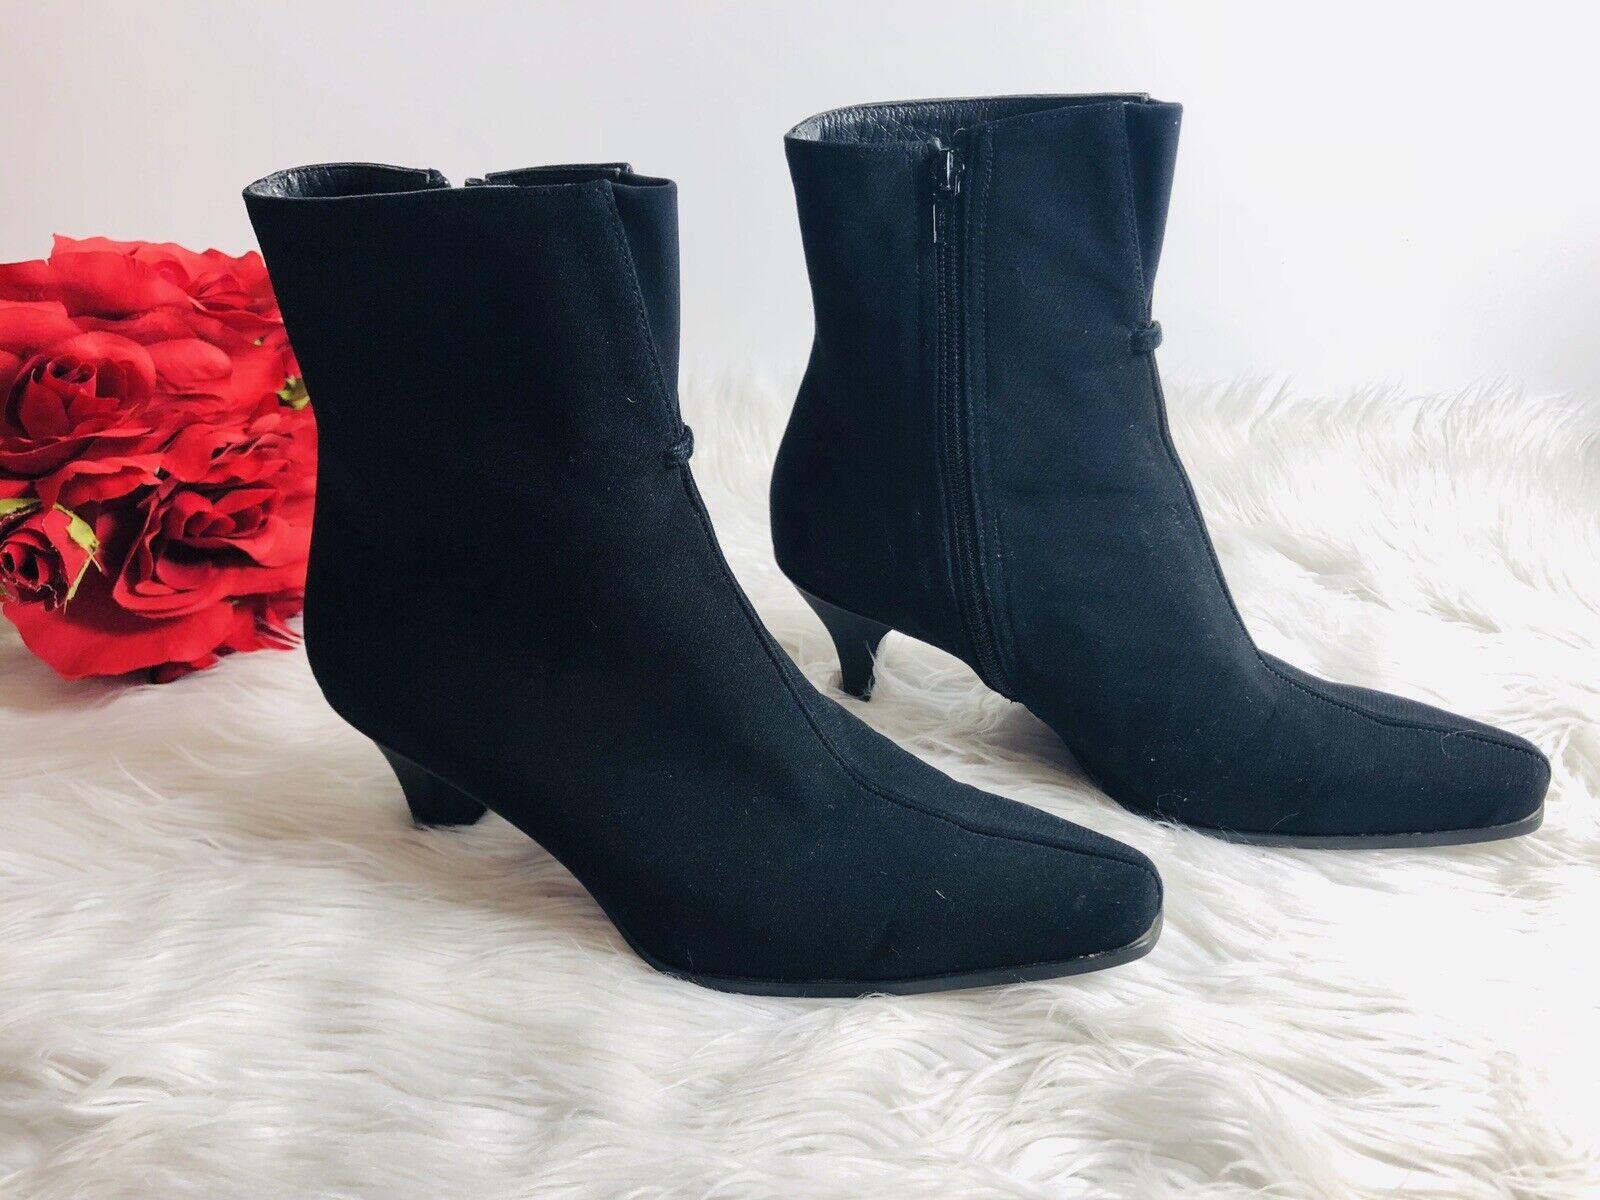 Stuart Weitzman Womens Back Zip Suede Ankle Boots Black Size 8W  8 1 2 M